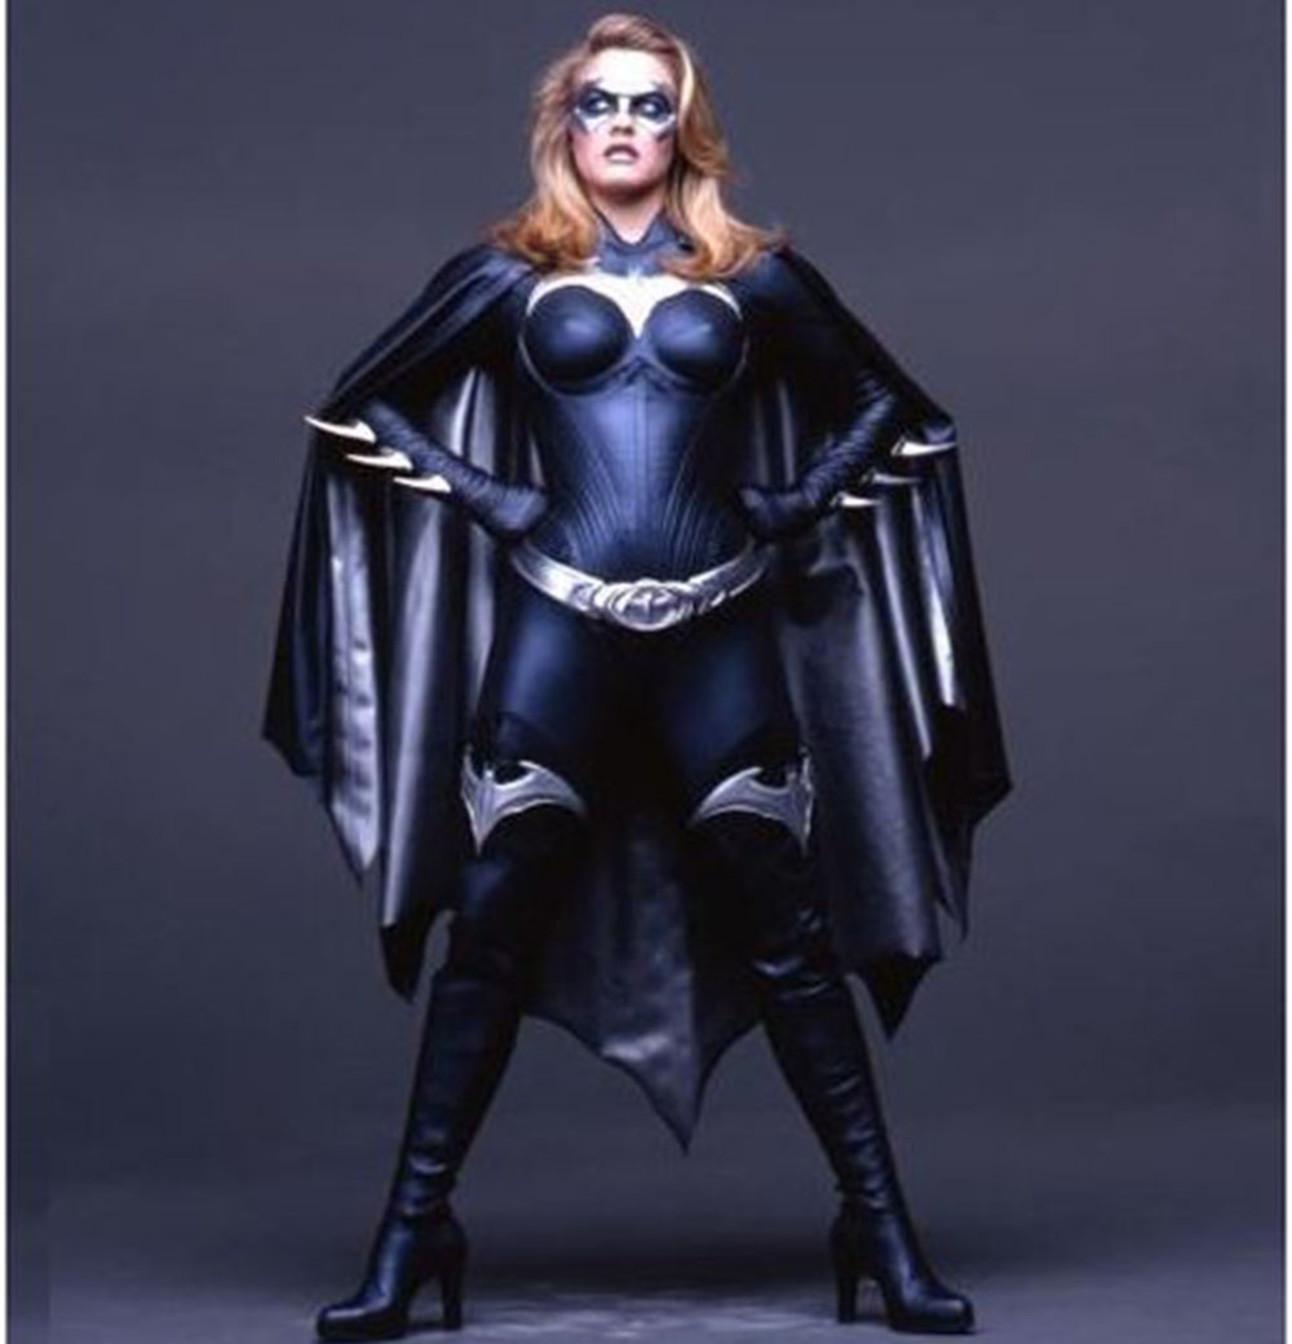 BatgirlAlicia.jpg